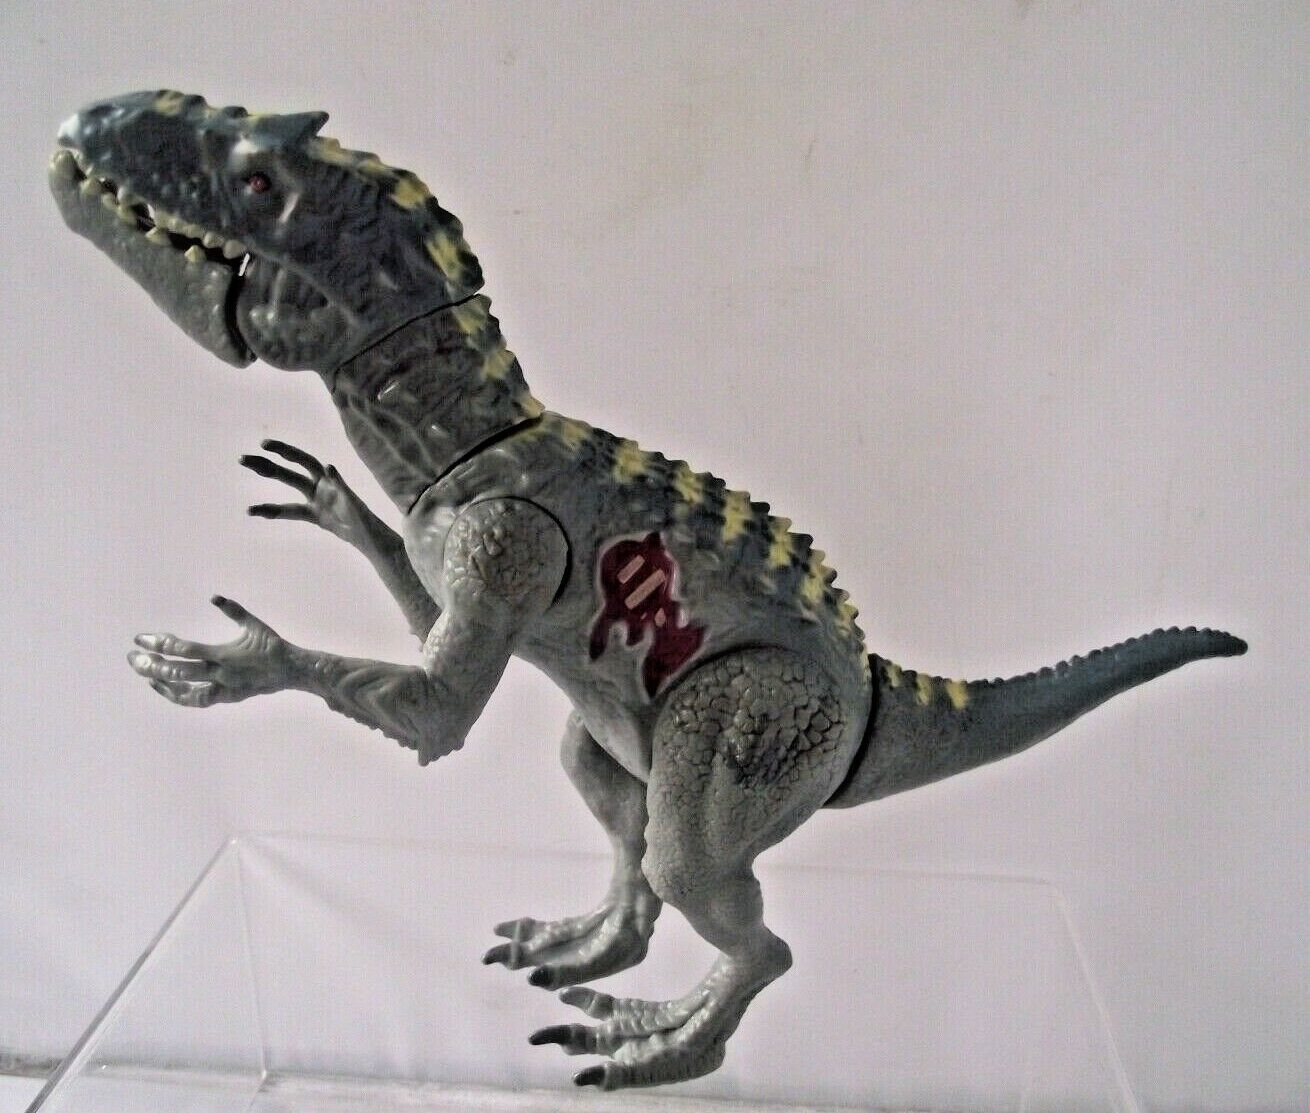 Hasbro Jurassic World Bashers and Biters INDOMINUS REX Dinosaur Figure Rare